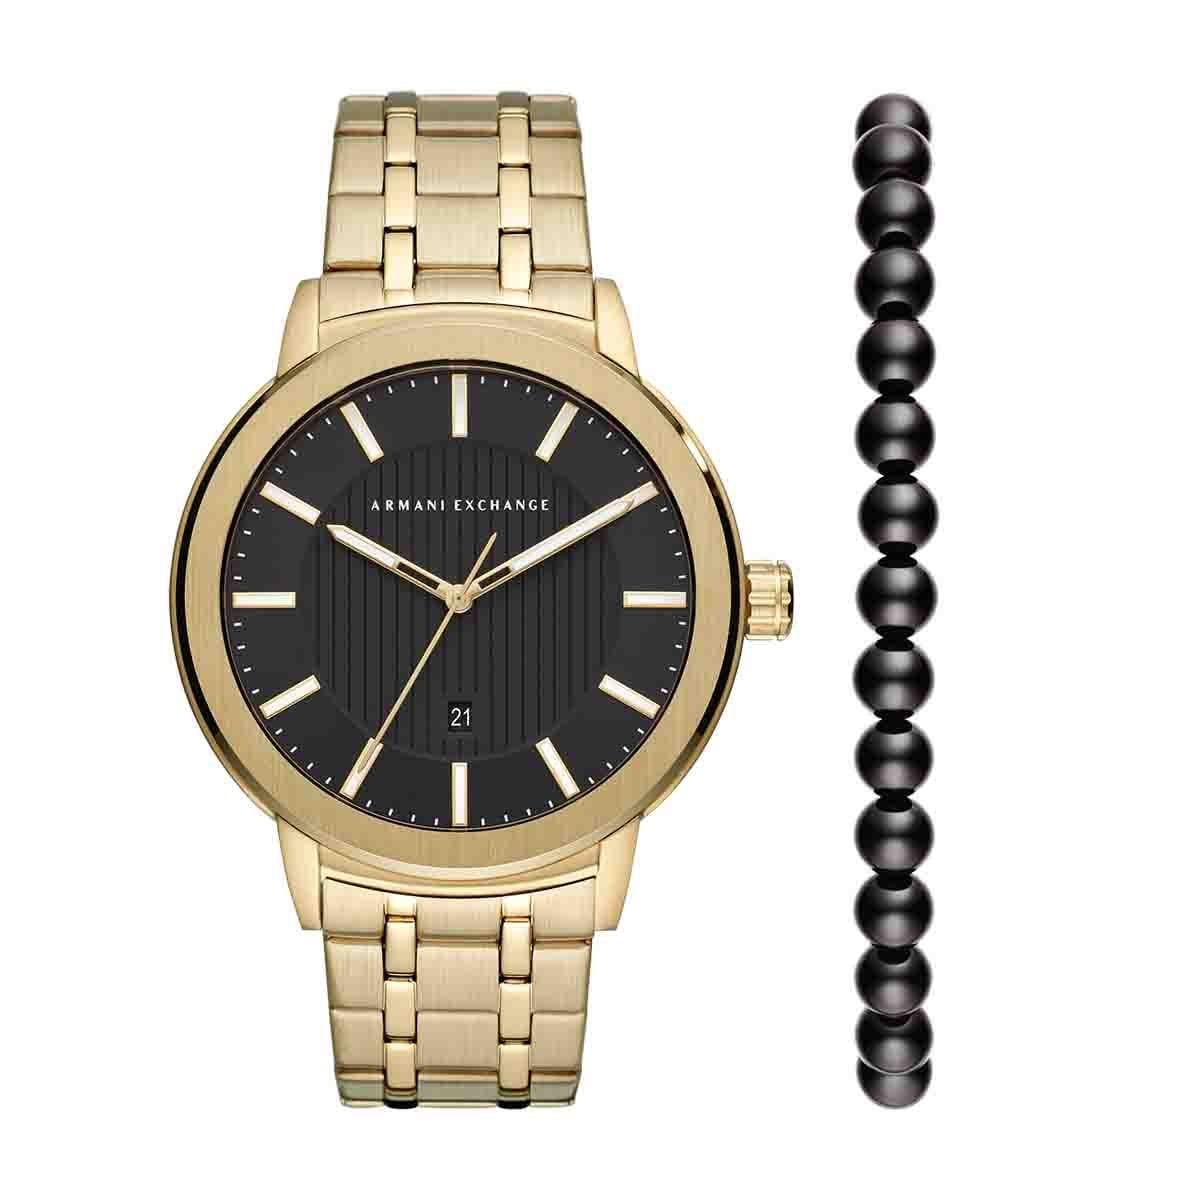 384053510324 Reloj para caballero color dorado armani exchange